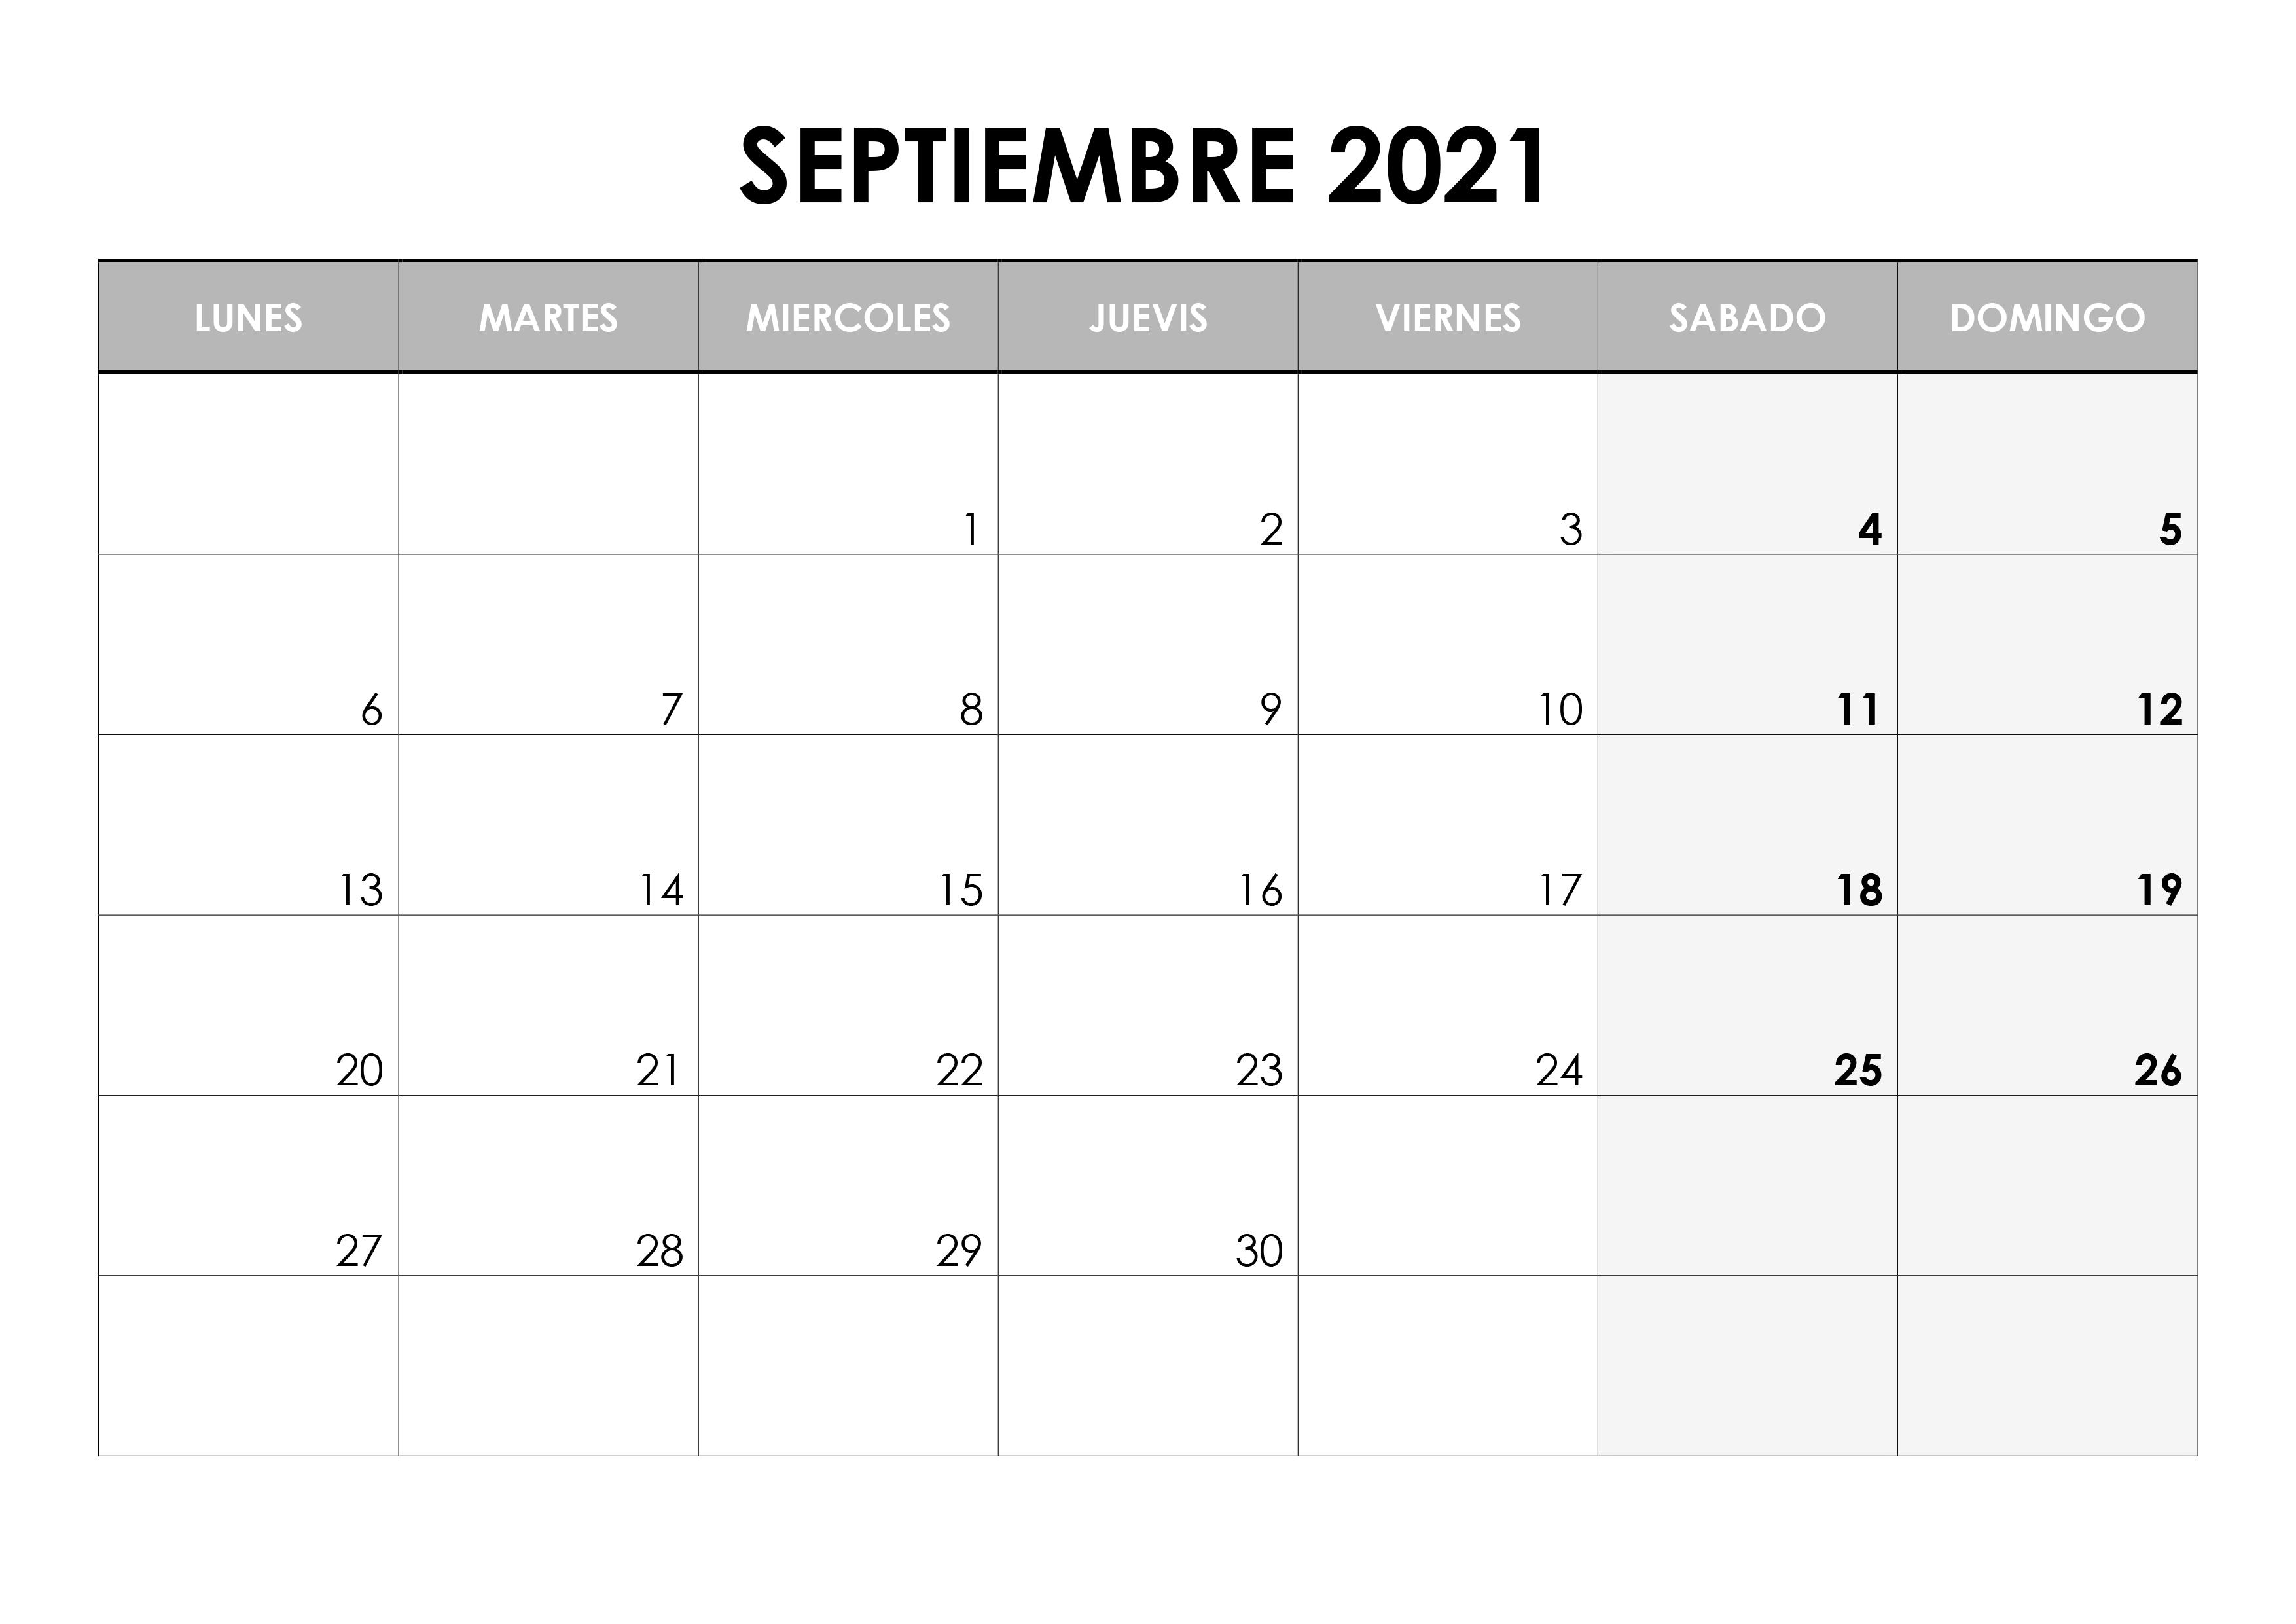 Septiembre 2021 Calendario Word